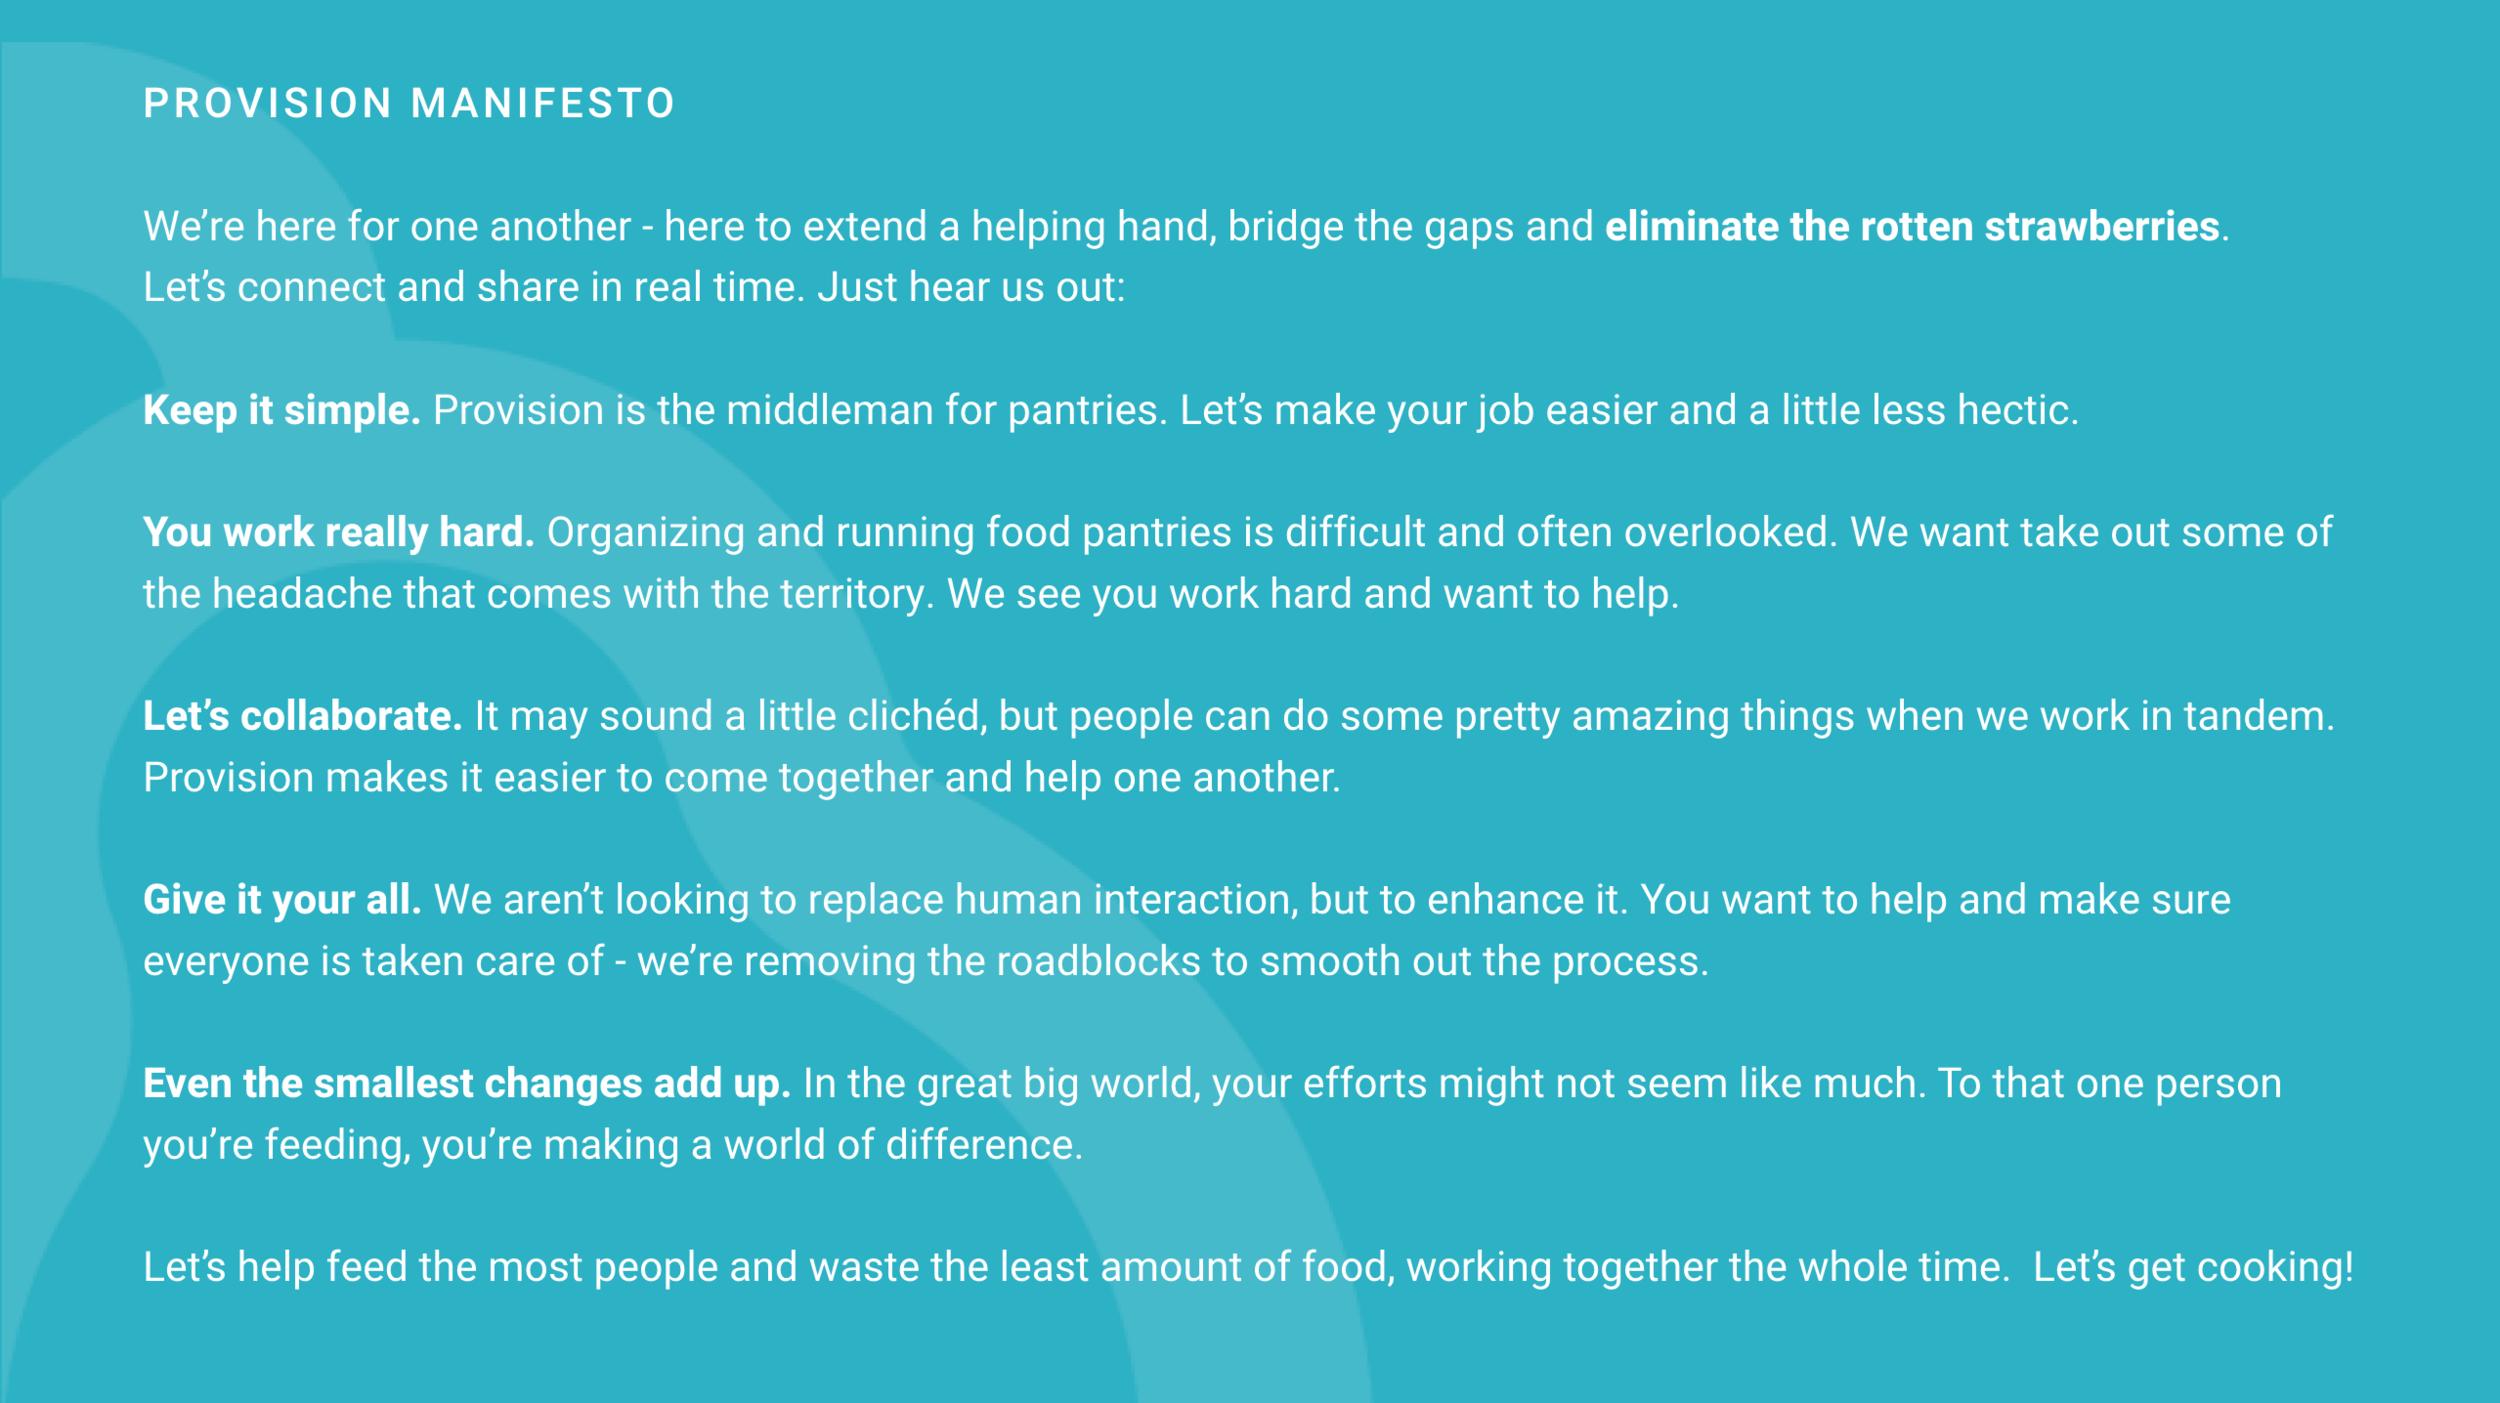 Provision_Manifesto.png